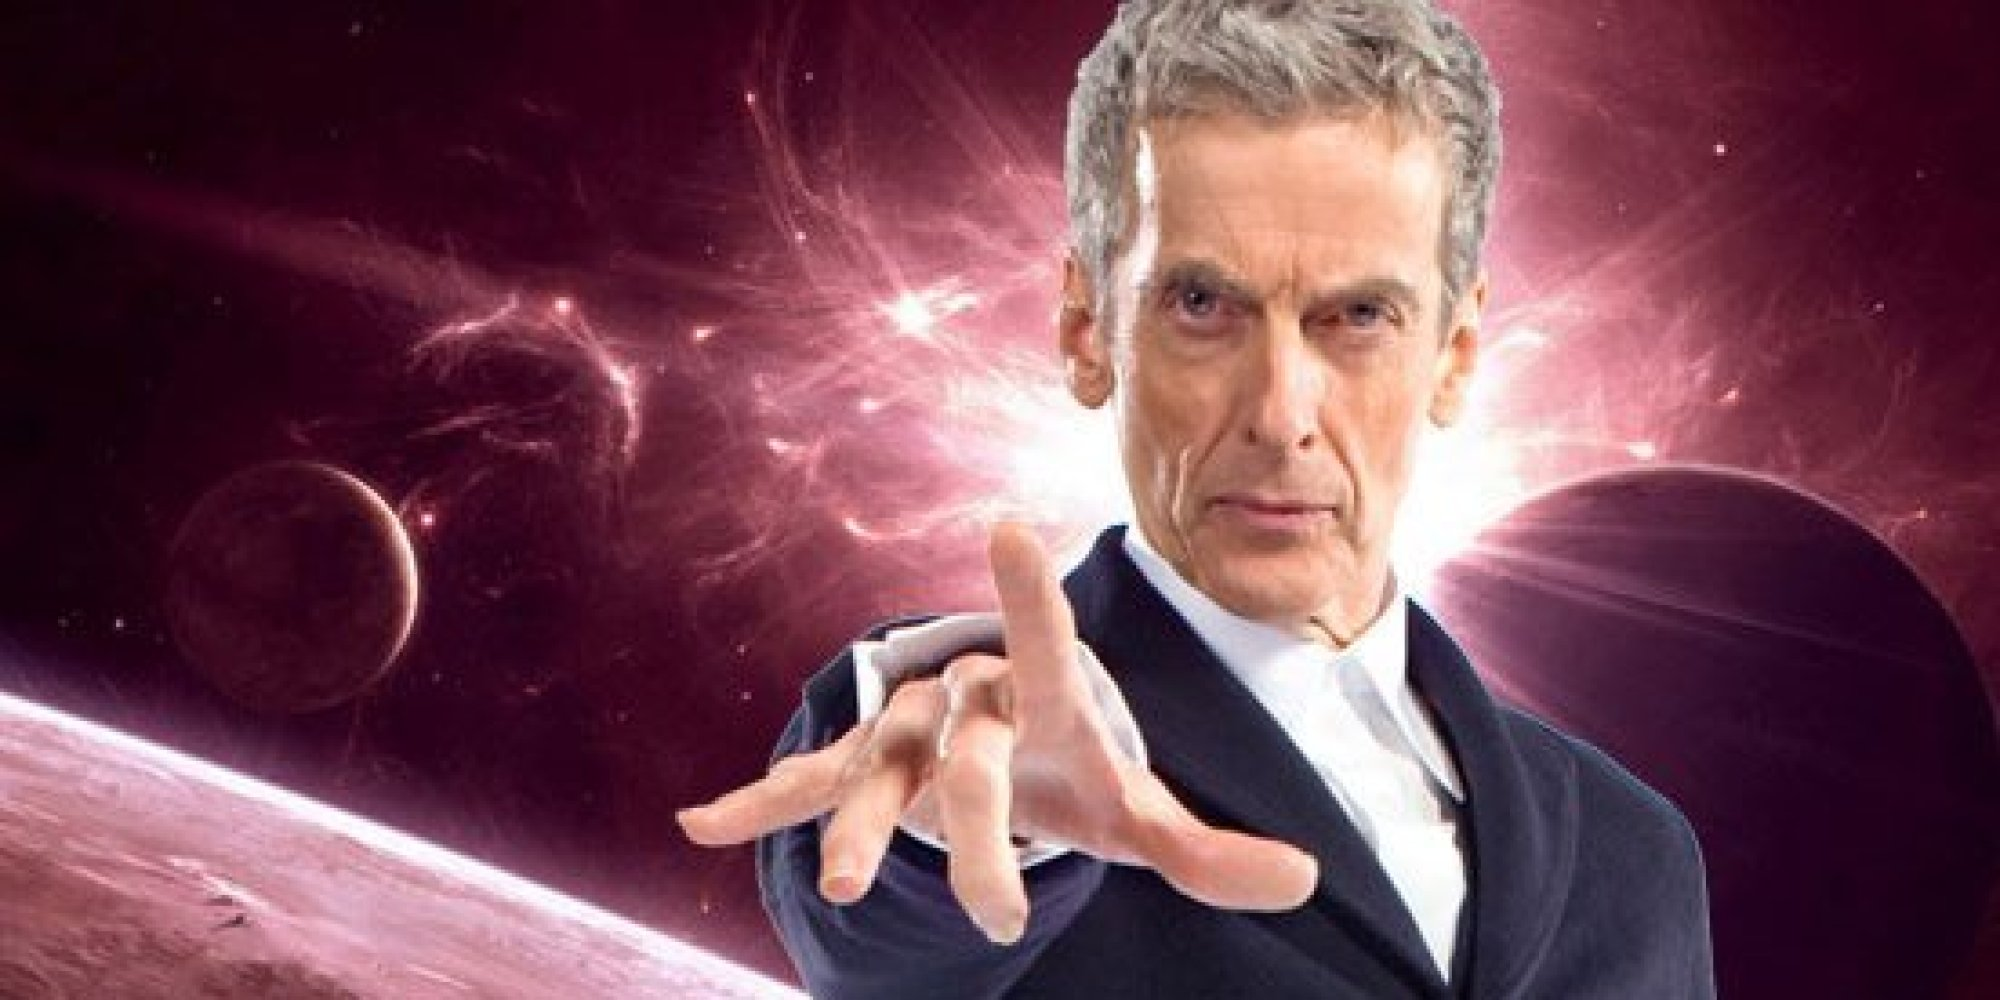 Peter Capaldi reveals series 10 start date